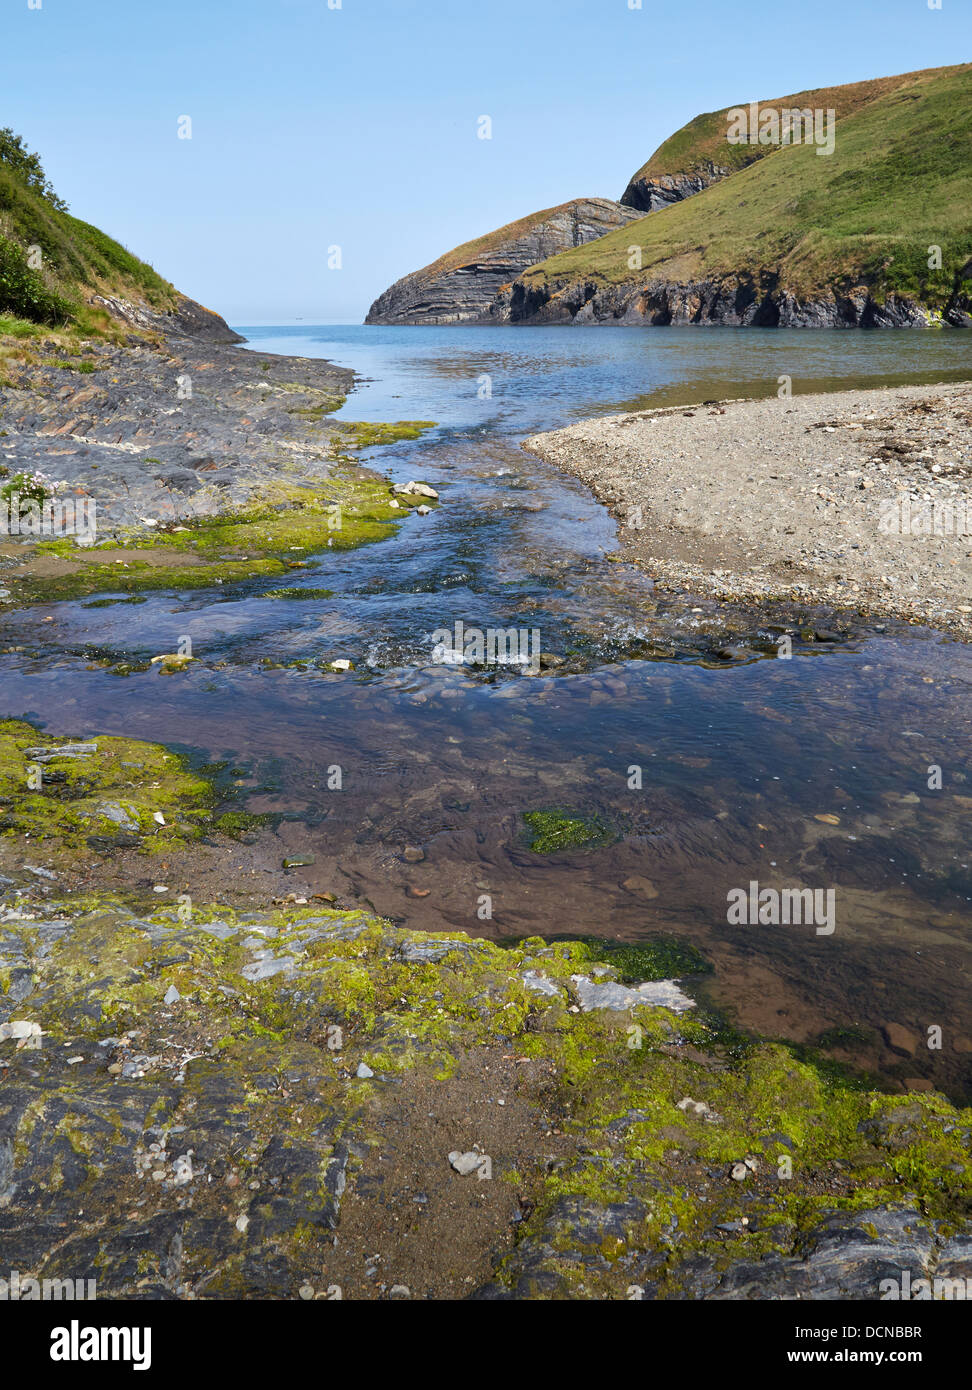 Nant Ceibwr stream entering Cardigan Bay at Ceibwr Bay near Cardigan on the South Wales coast path - Stock Image